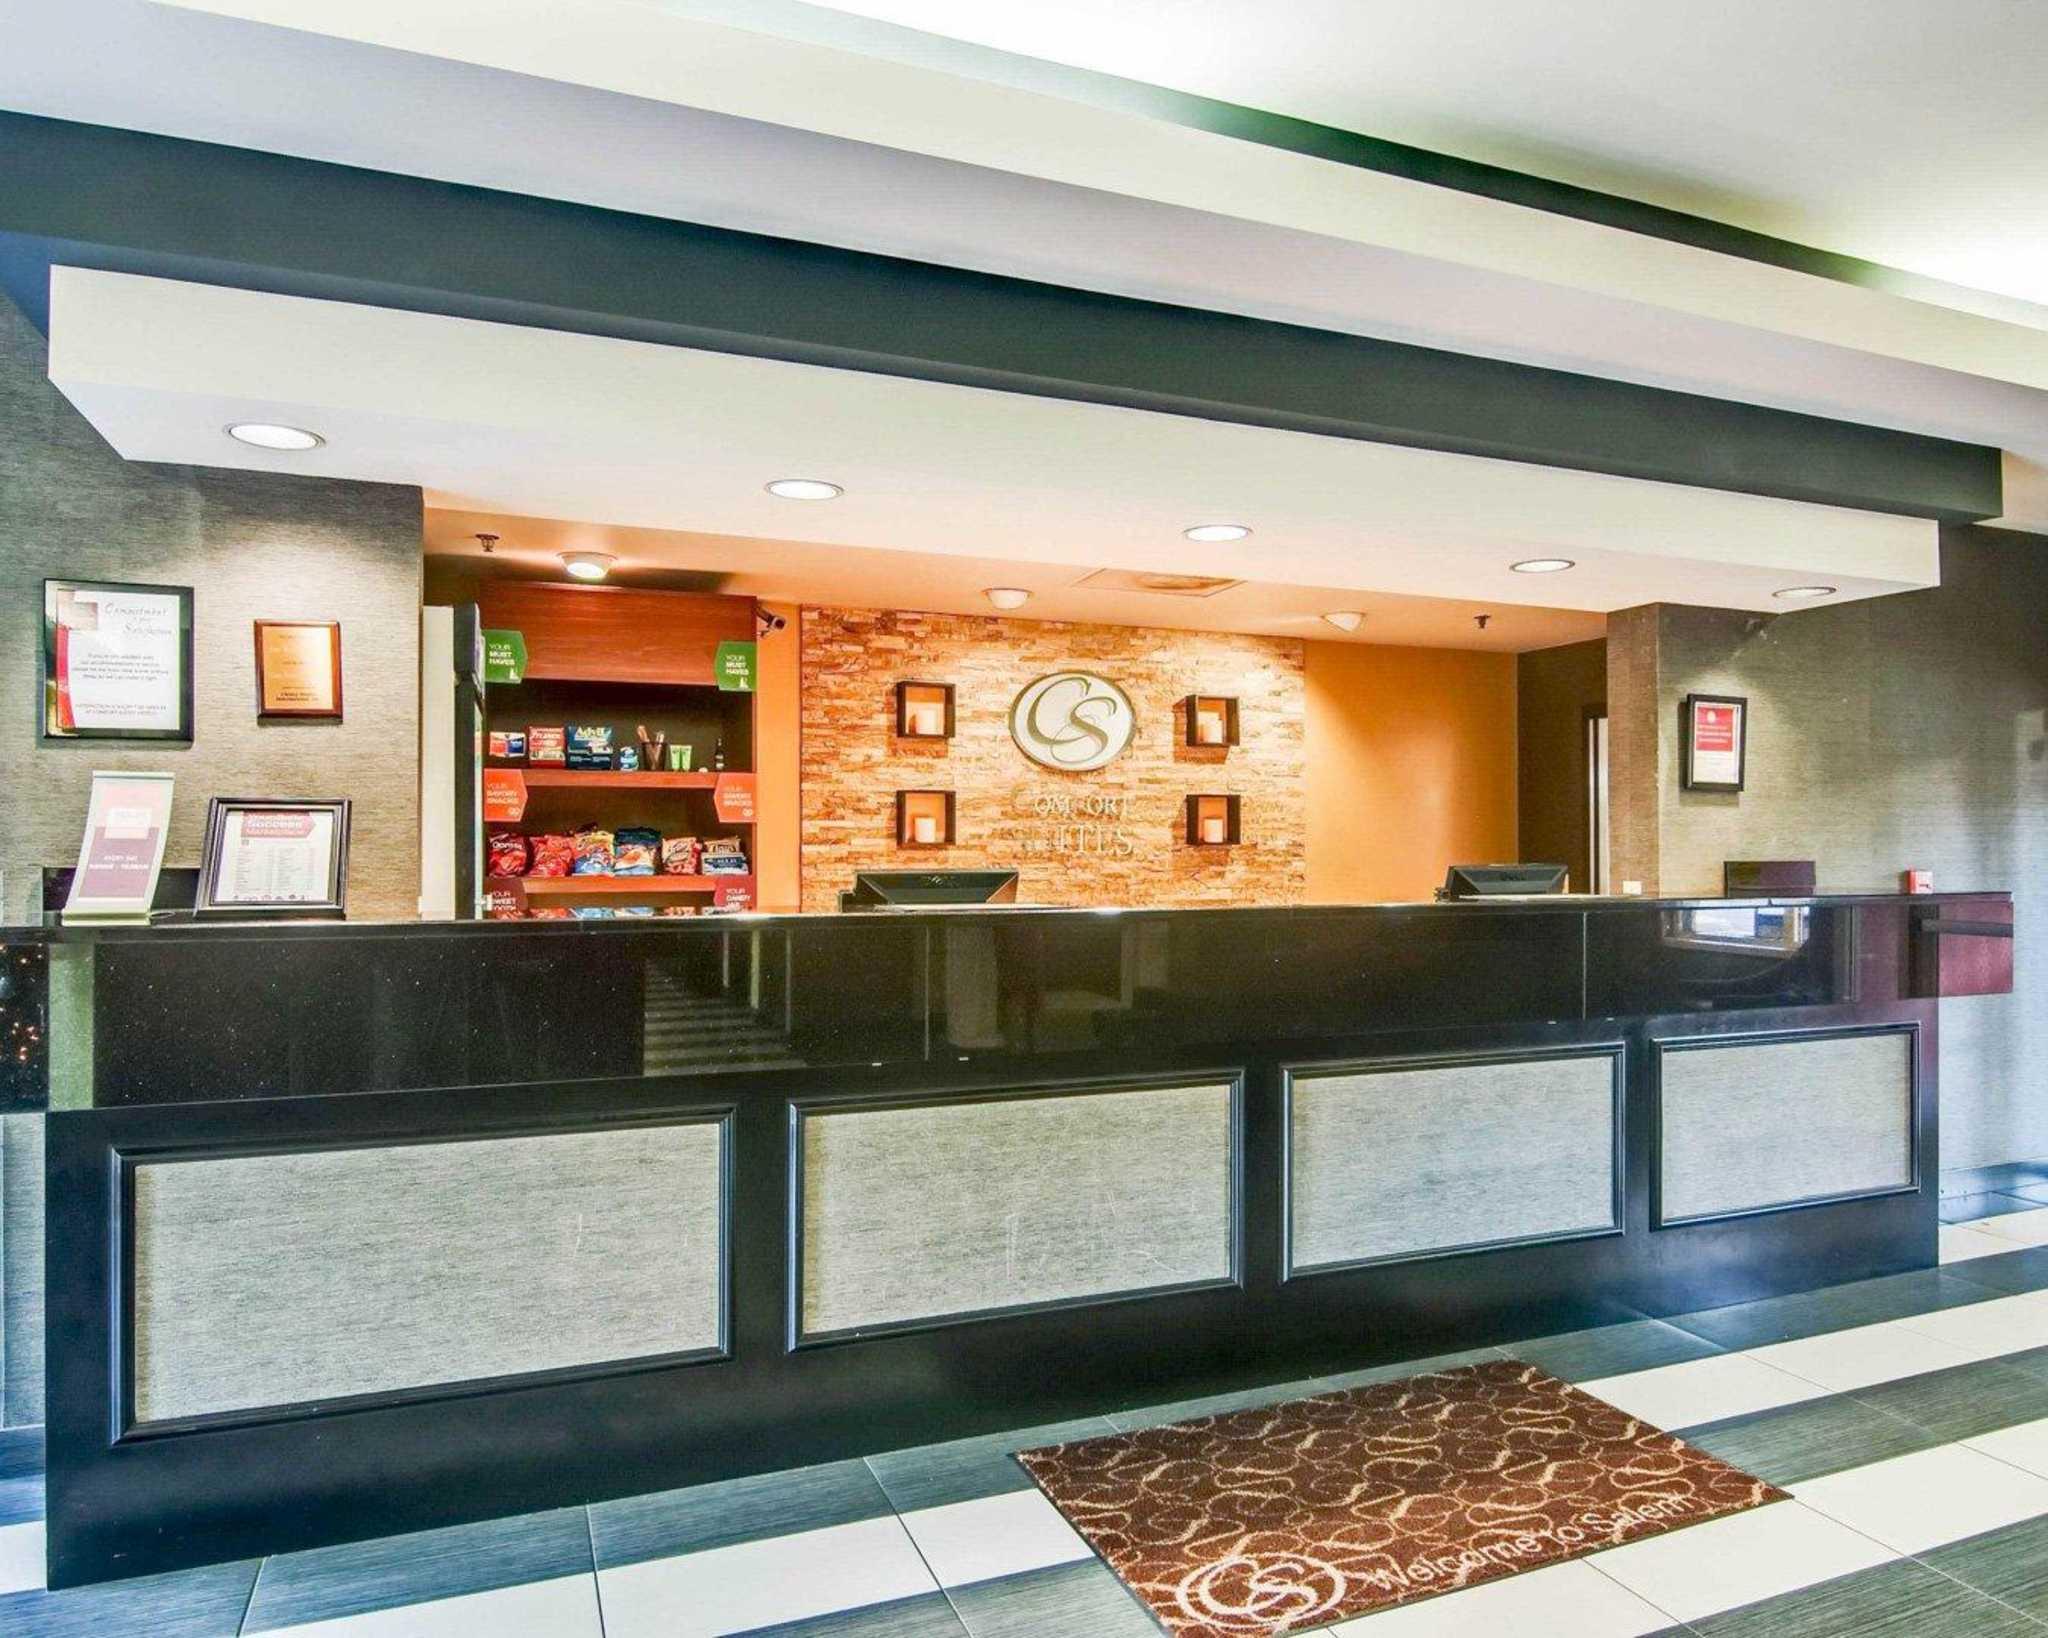 Comfort Suites Inn at Ridgewood Farm image 9